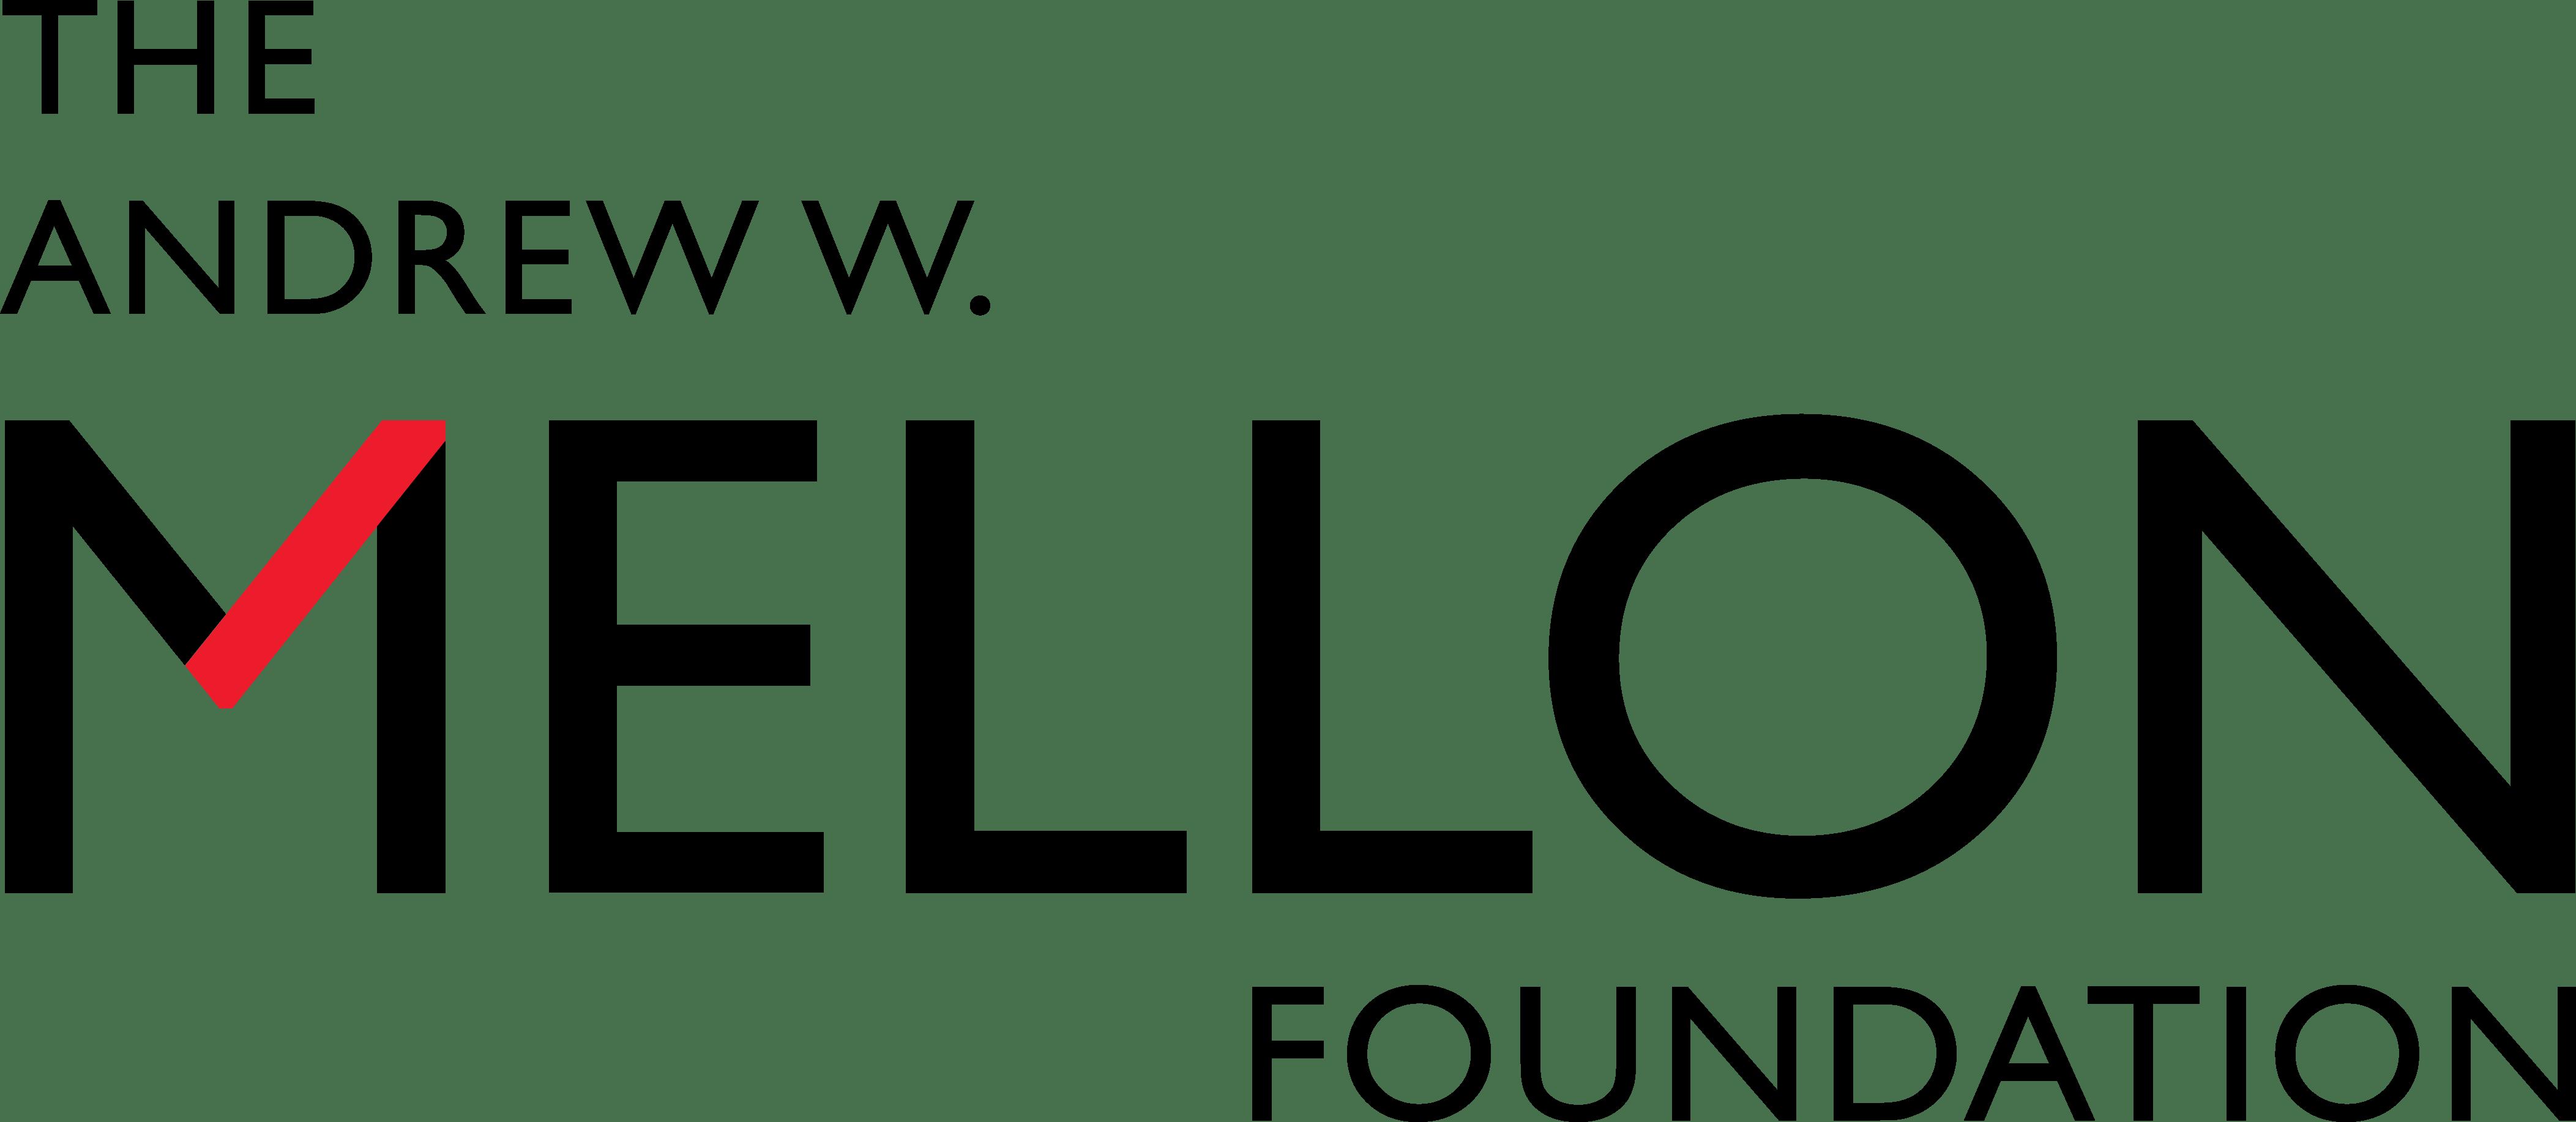 Logo: The Andrew W. Mellon Foundation